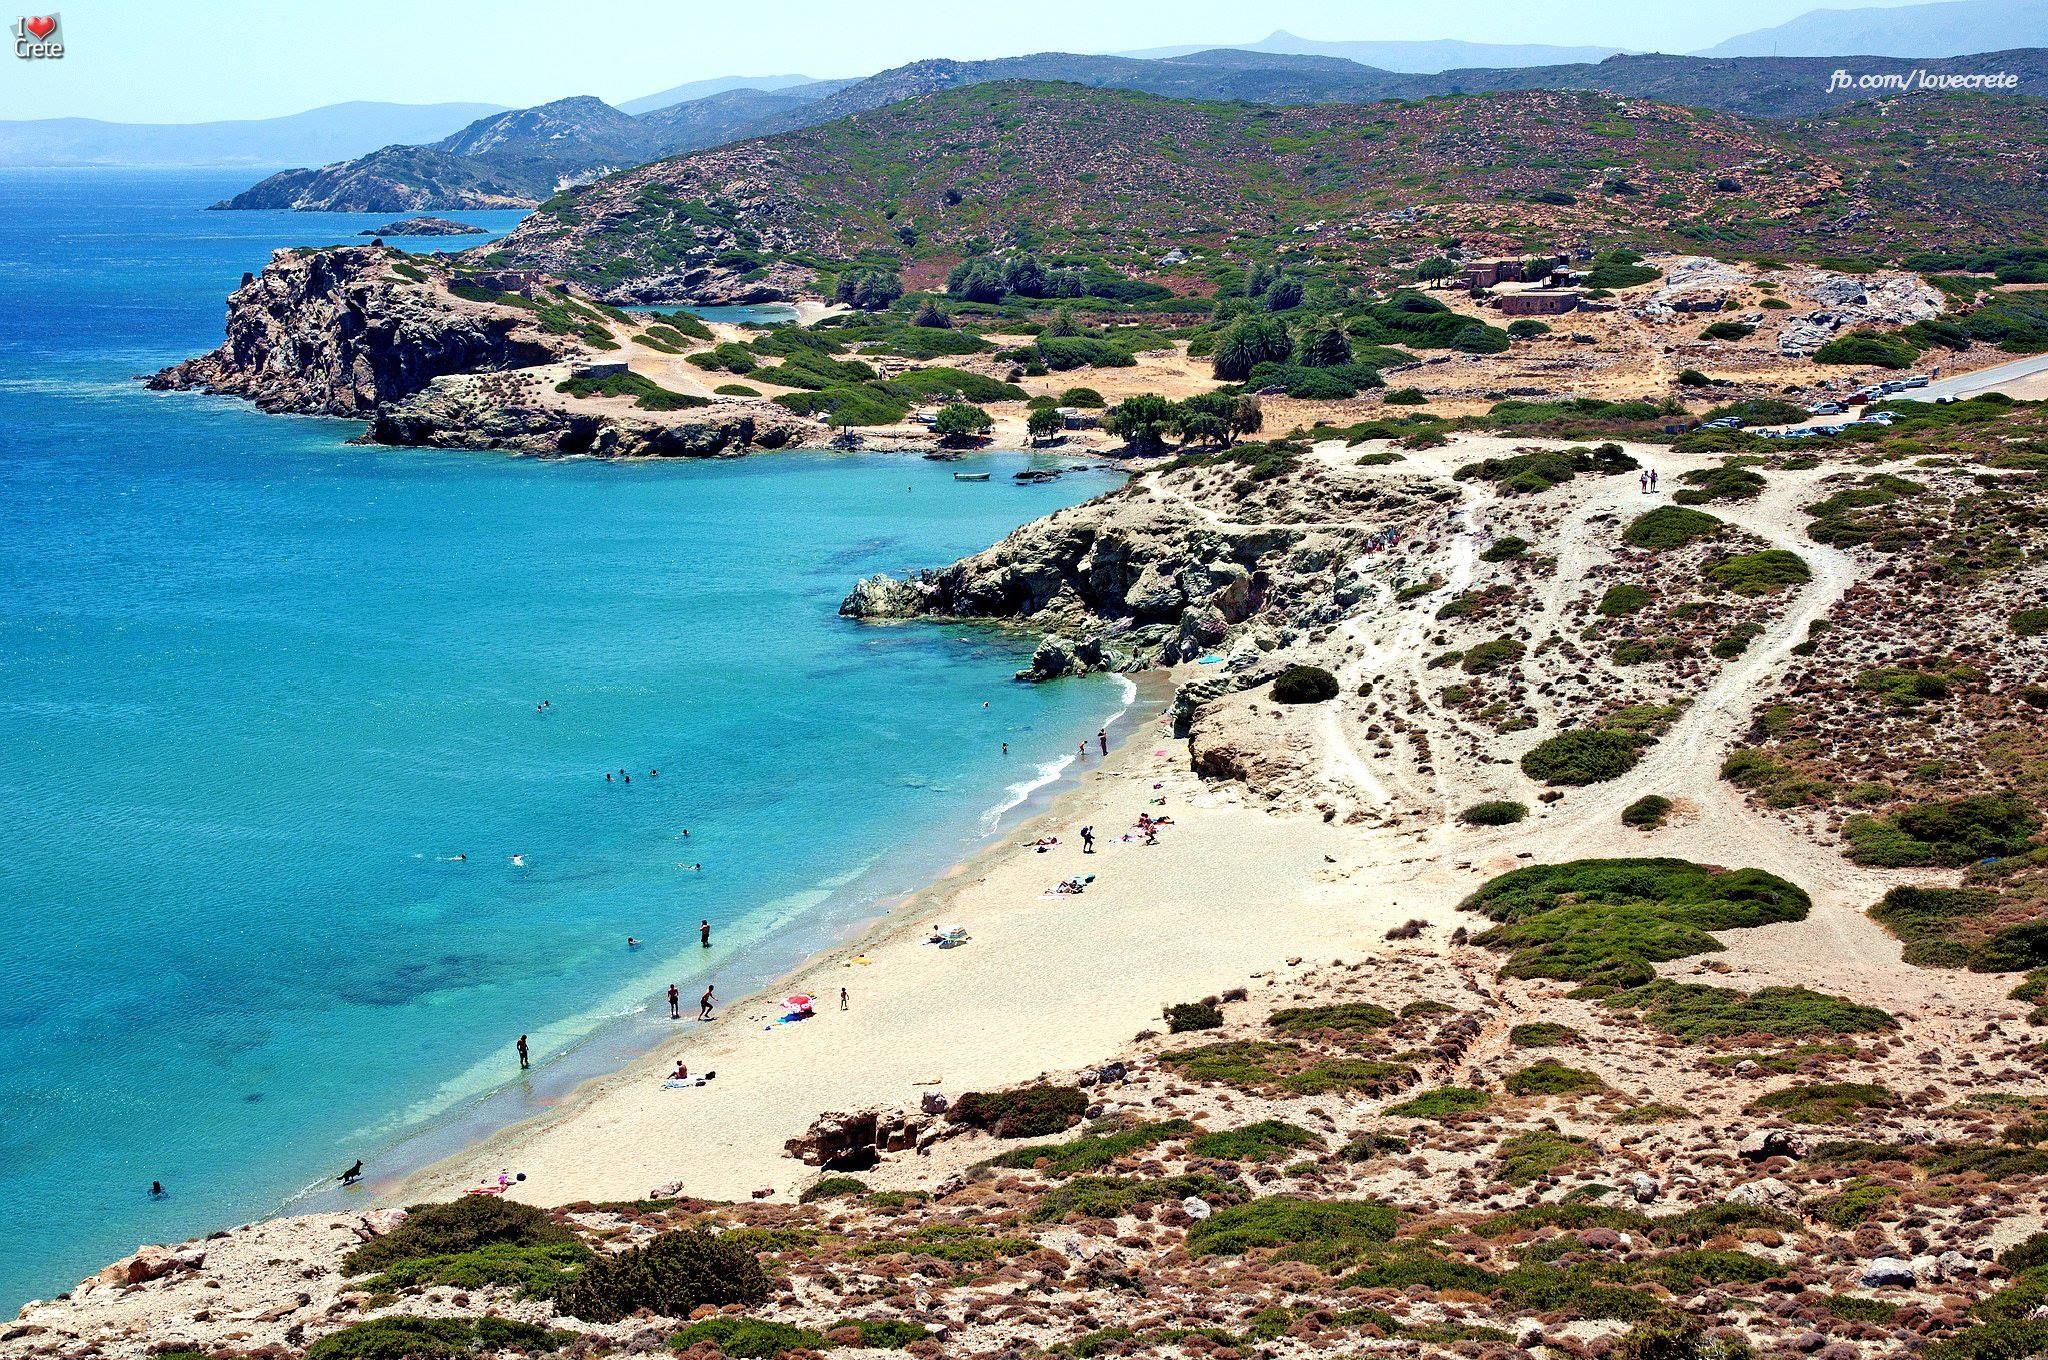 Kreta, Itanos Beach (Textil- und FKK-Strand) Photo from